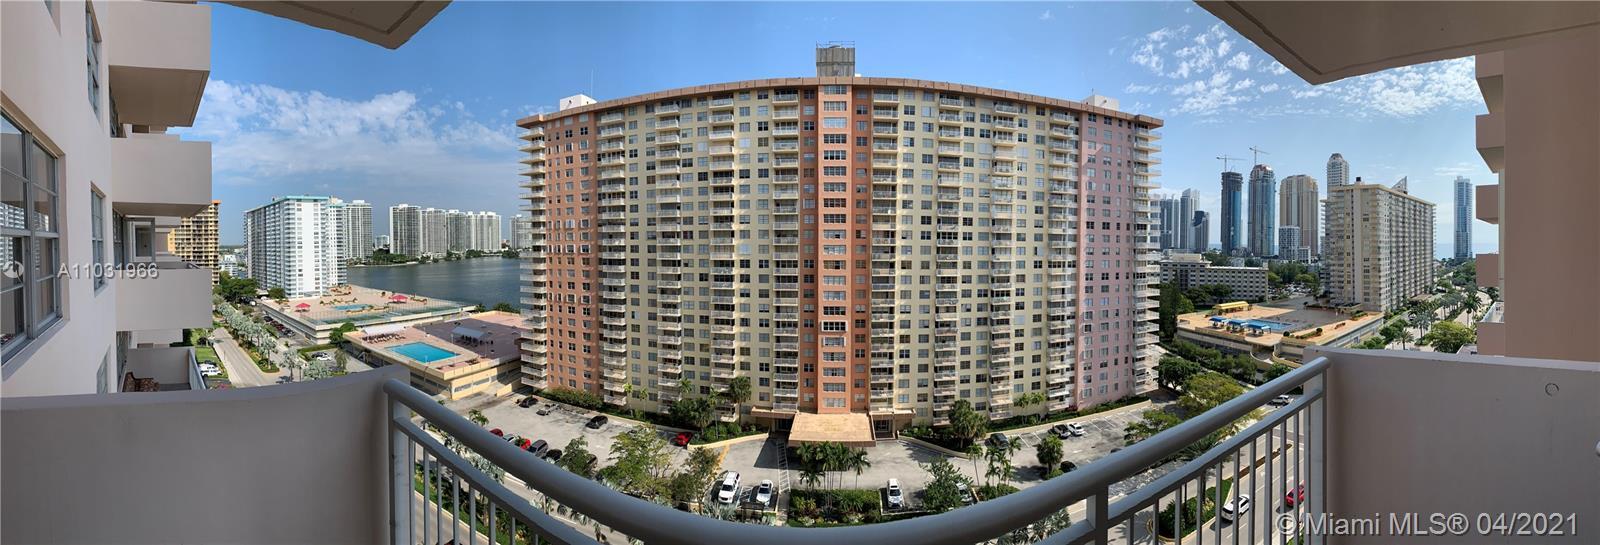 Winston Tower 100 #1406 - 250 174th St #1406, Sunny Isles Beach, FL 33160